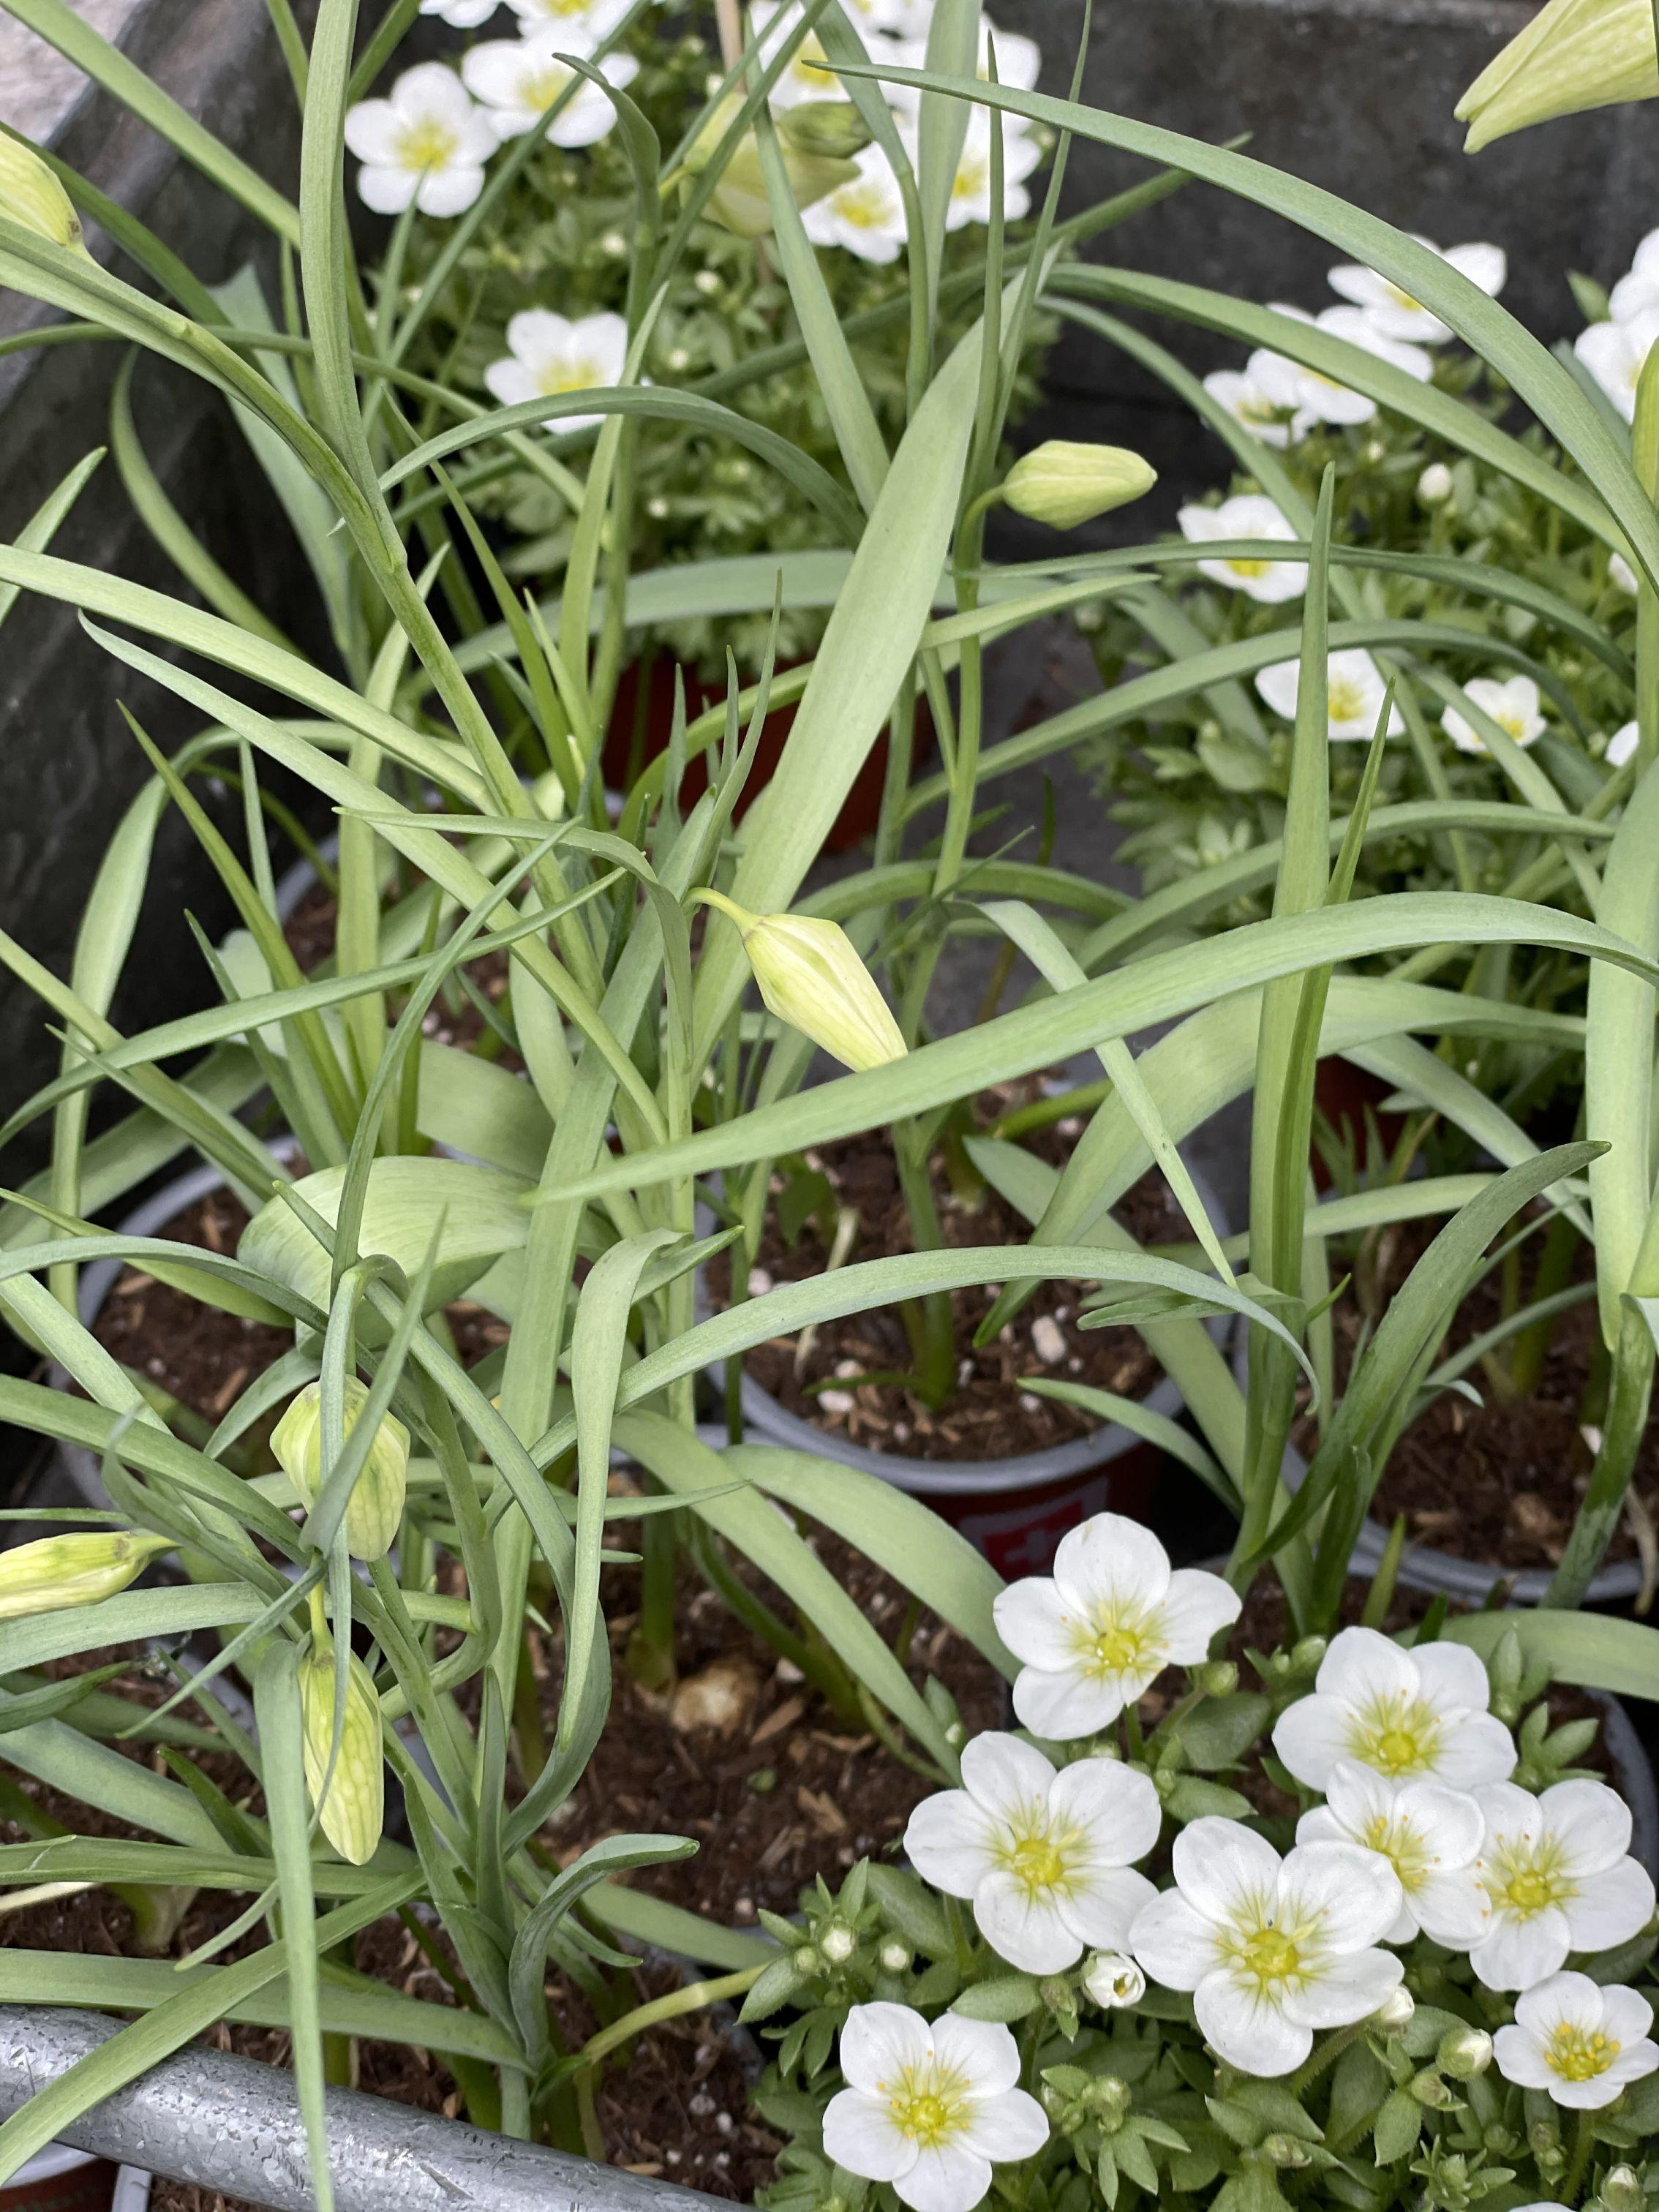 Fritillaria / Saxifraga